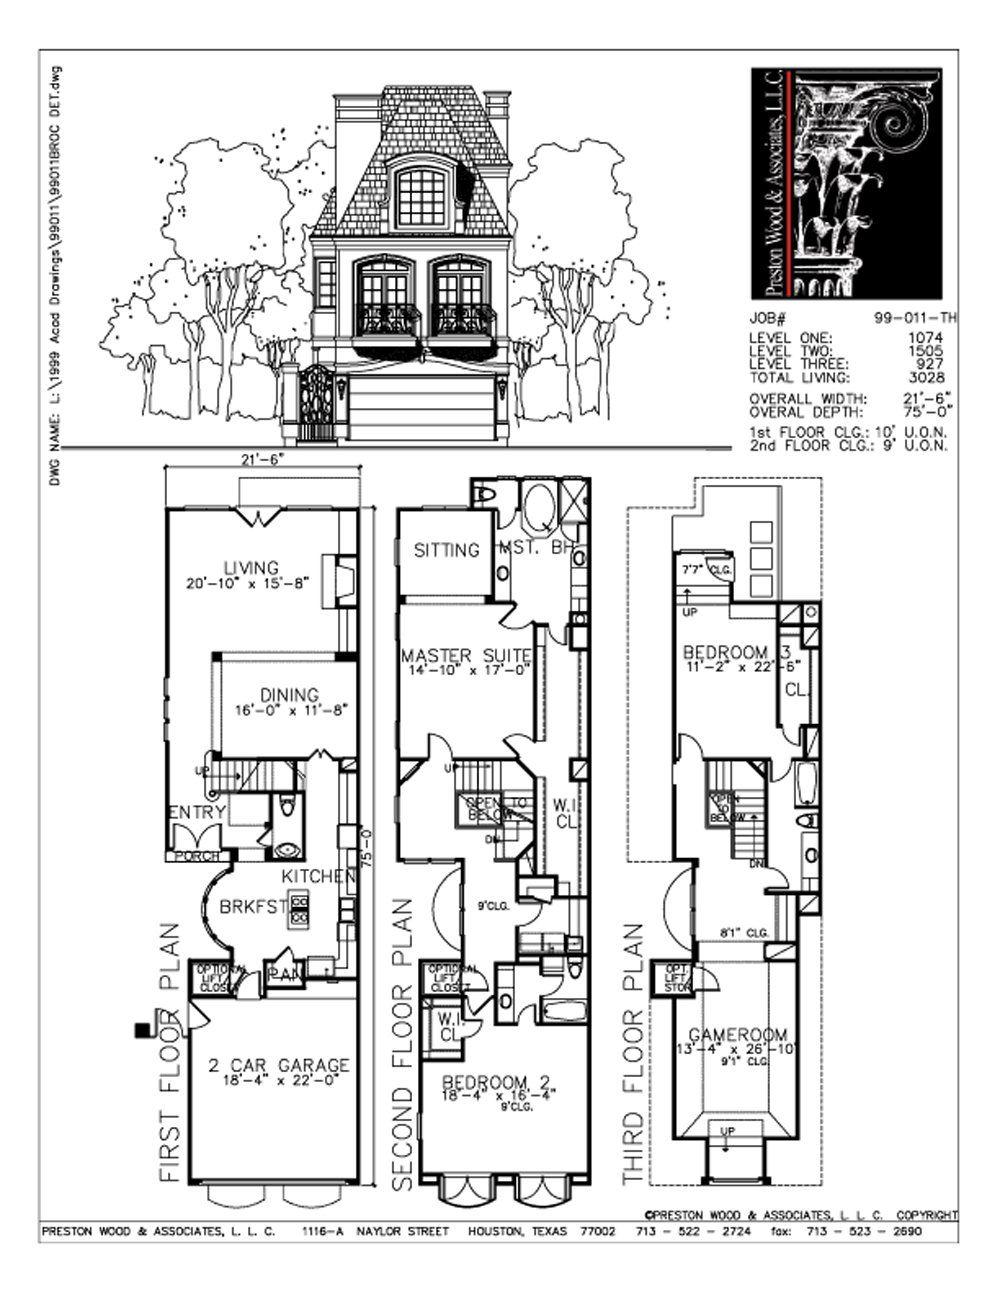 Urban Townhome Floor Plans, Town House Development, Row